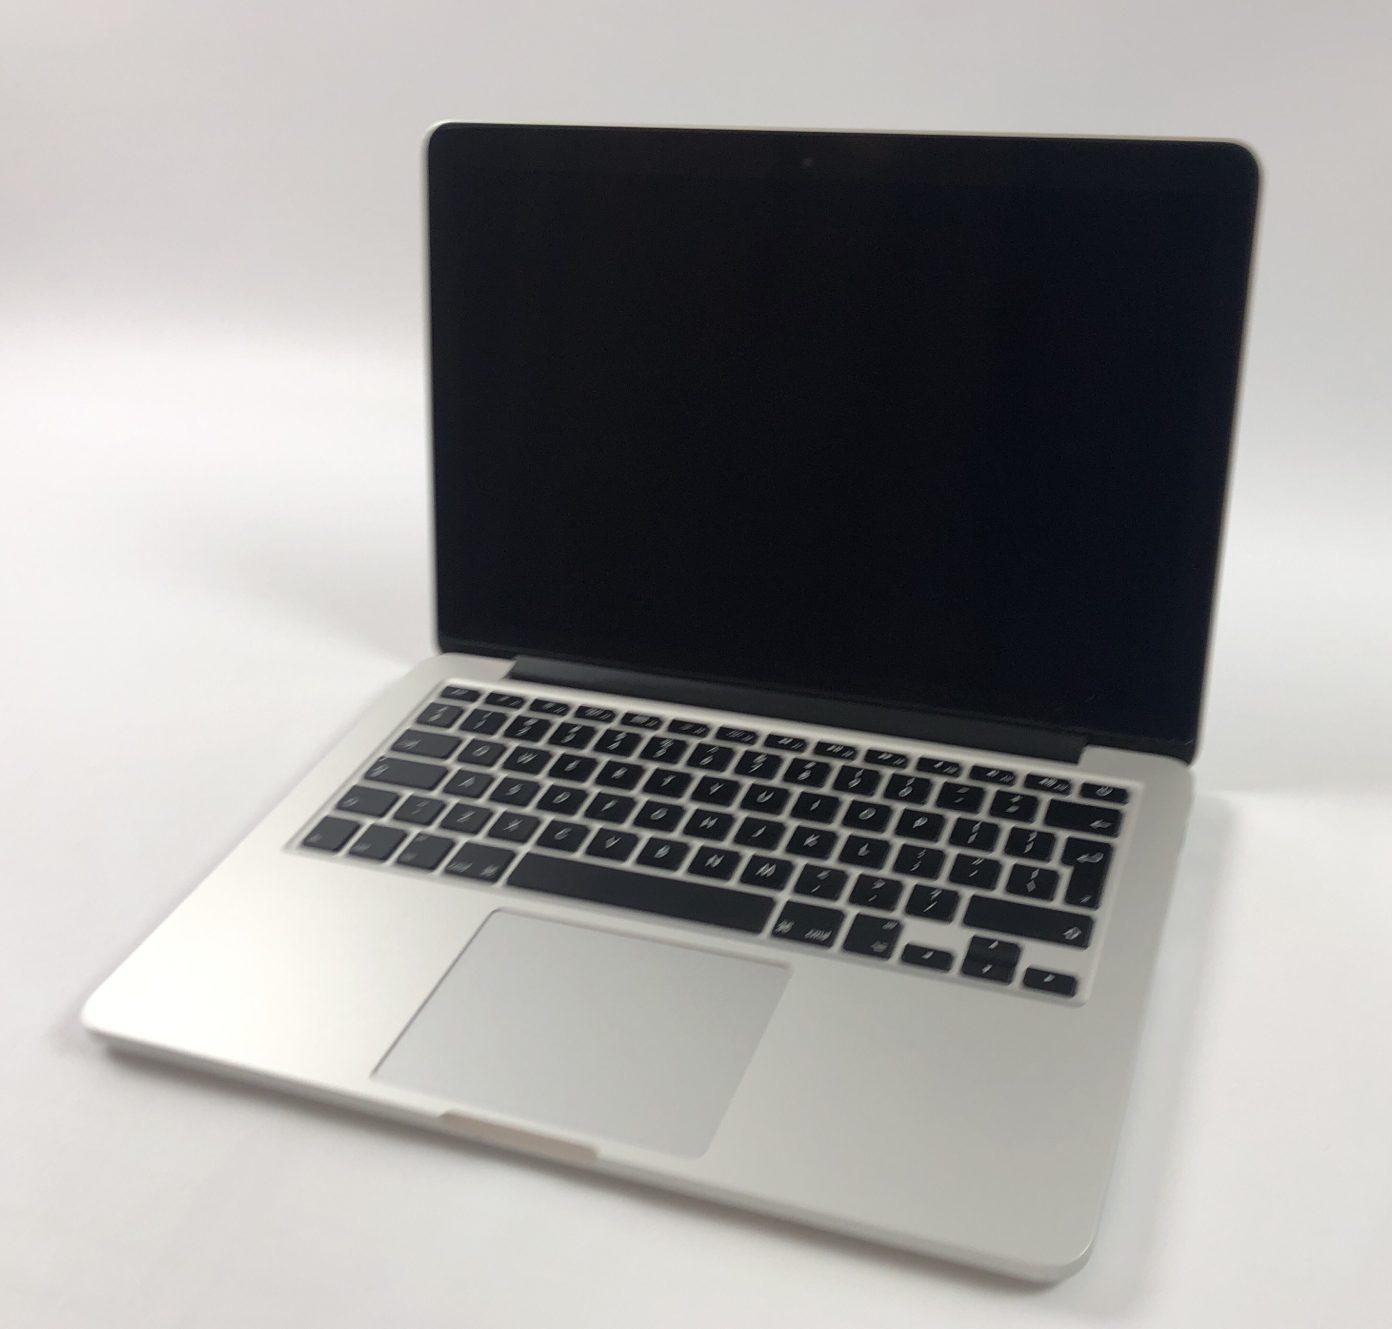 "MacBook Pro Retina 13"" Mid 2014 (Intel Core i5 2.6 GHz 8 GB RAM 256 GB SSD), Intel Core i5 2.6 GHz, 8 GB RAM, 256 GB SSD, obraz 1"